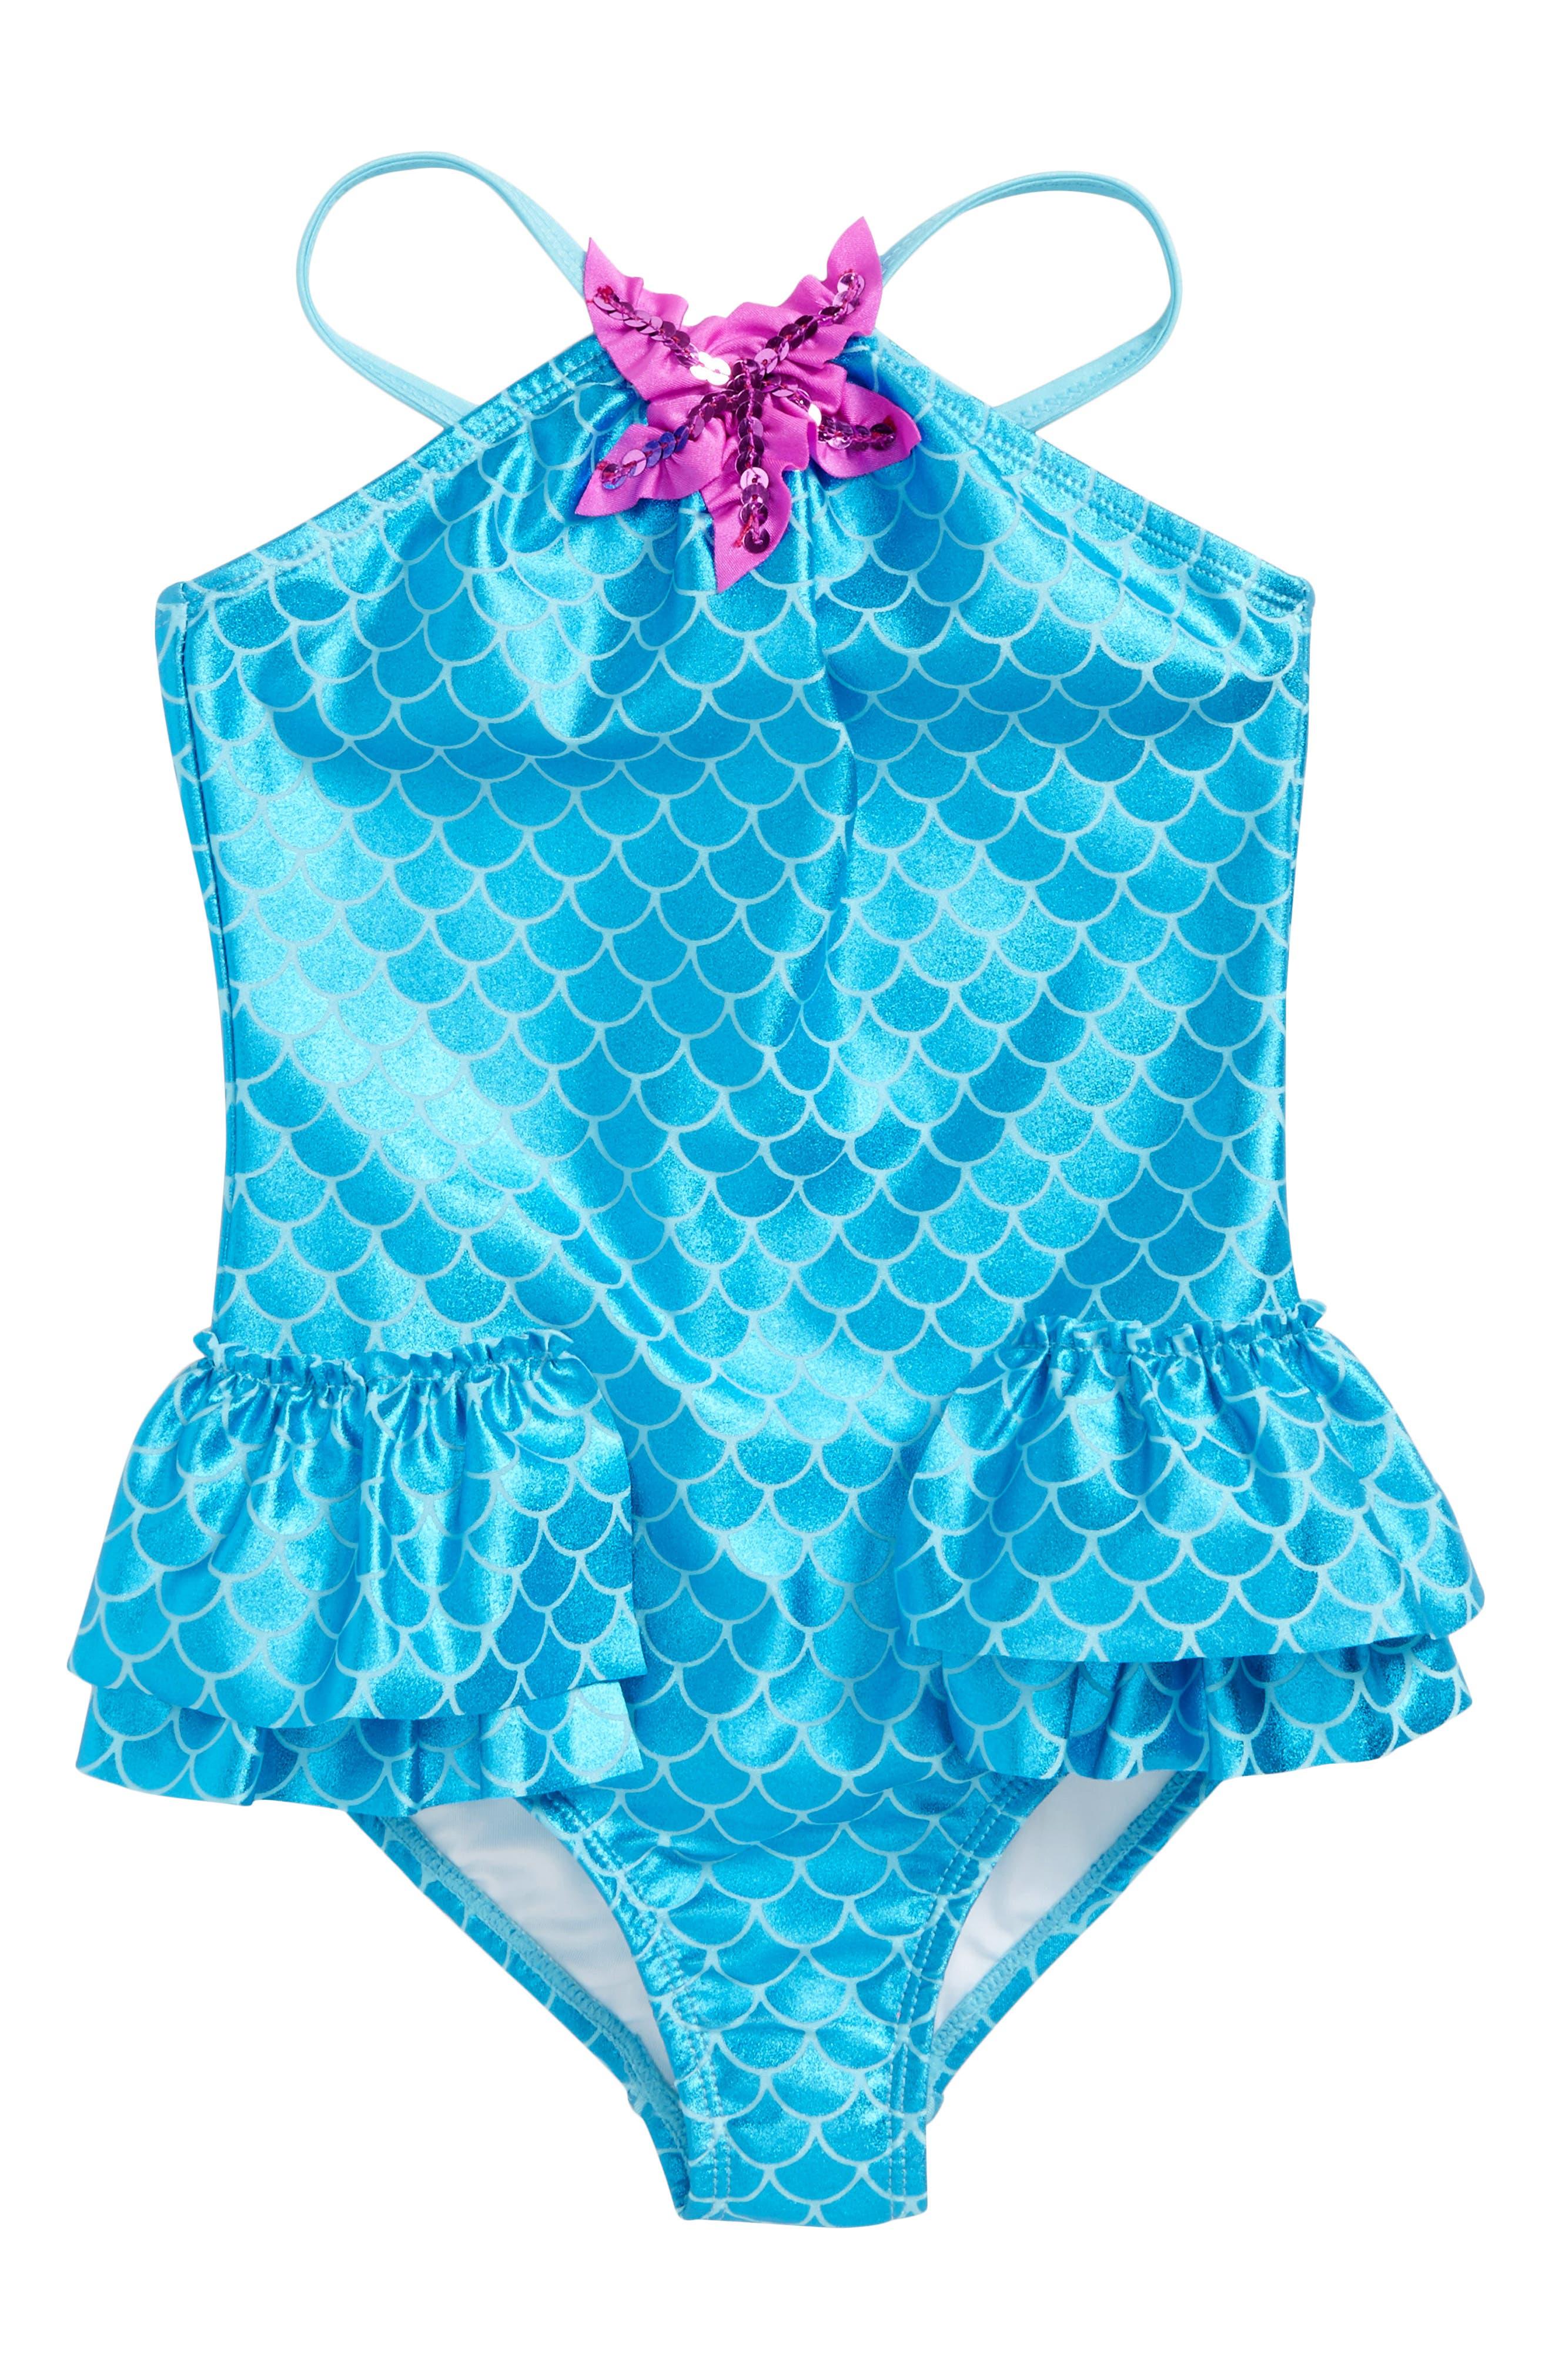 Alternate Image 1 Selected - Love U Lots Mermaid One-Piece Swimsuit (Toddler Girls & Little Girls)